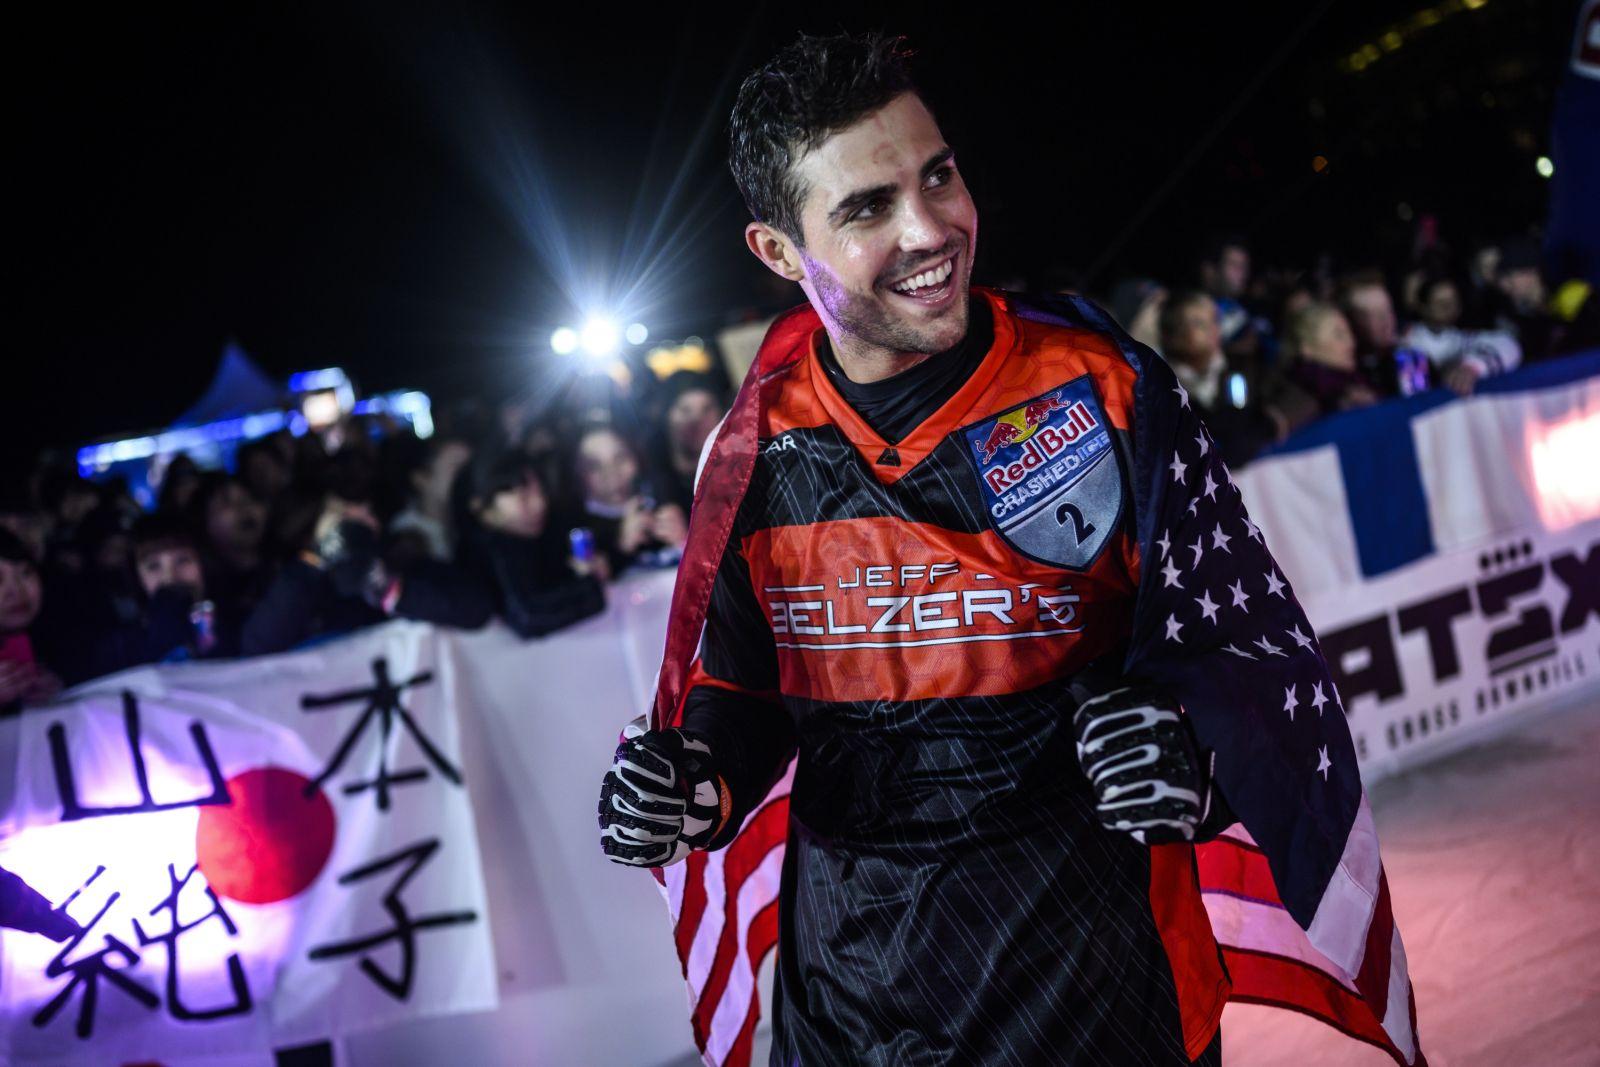 ATSX Red Bull Crashed Ice Comes to Japan via Yokohama Championship